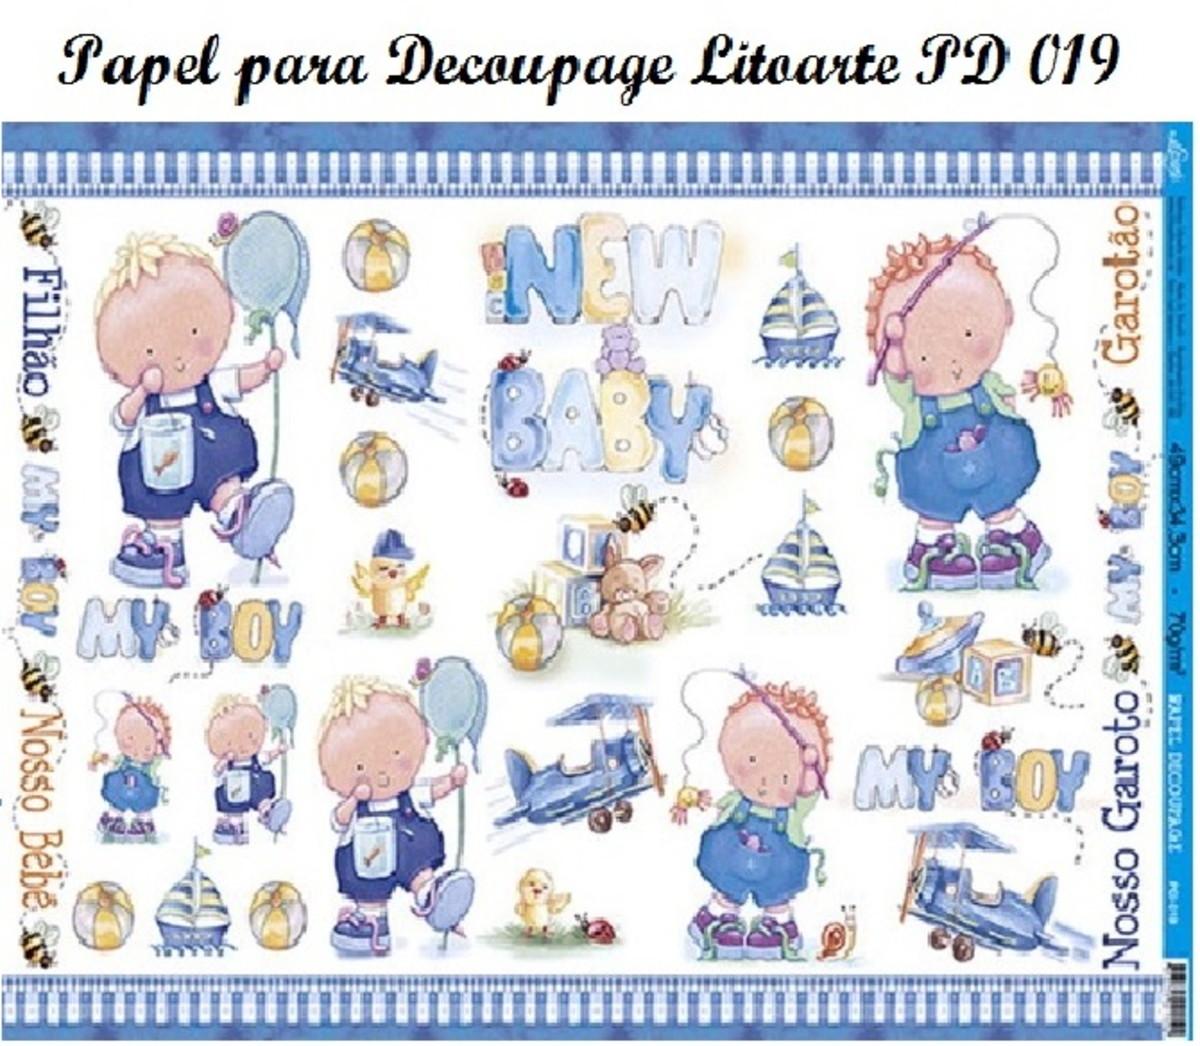 Lote com 19 folhas de papel para decoupage cole o menino - Papel decoupage infantil ...